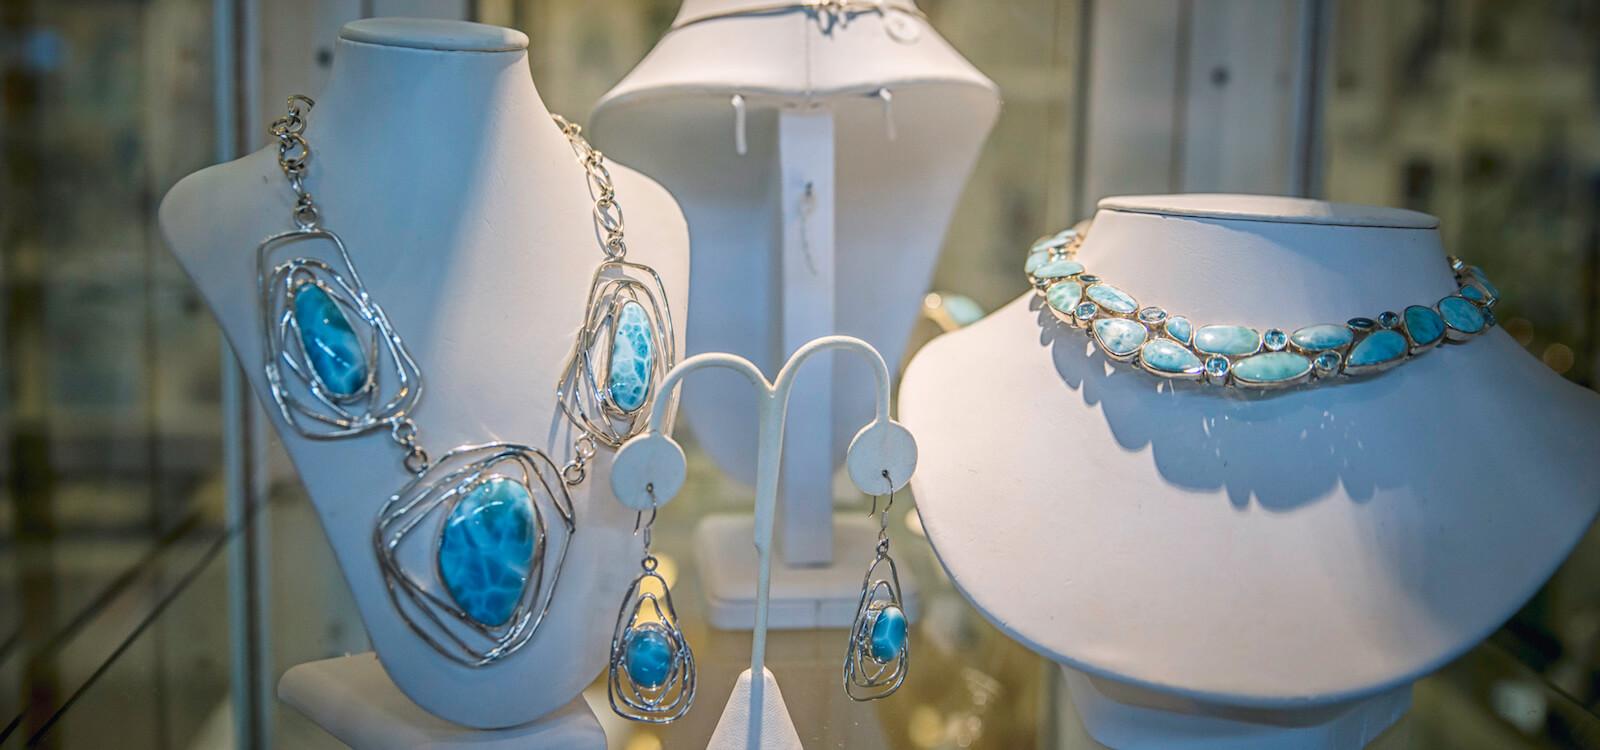 MustDo.com   Necklace from Fort Myers, Florida shopping. Photo by Jennifer Brinkman.